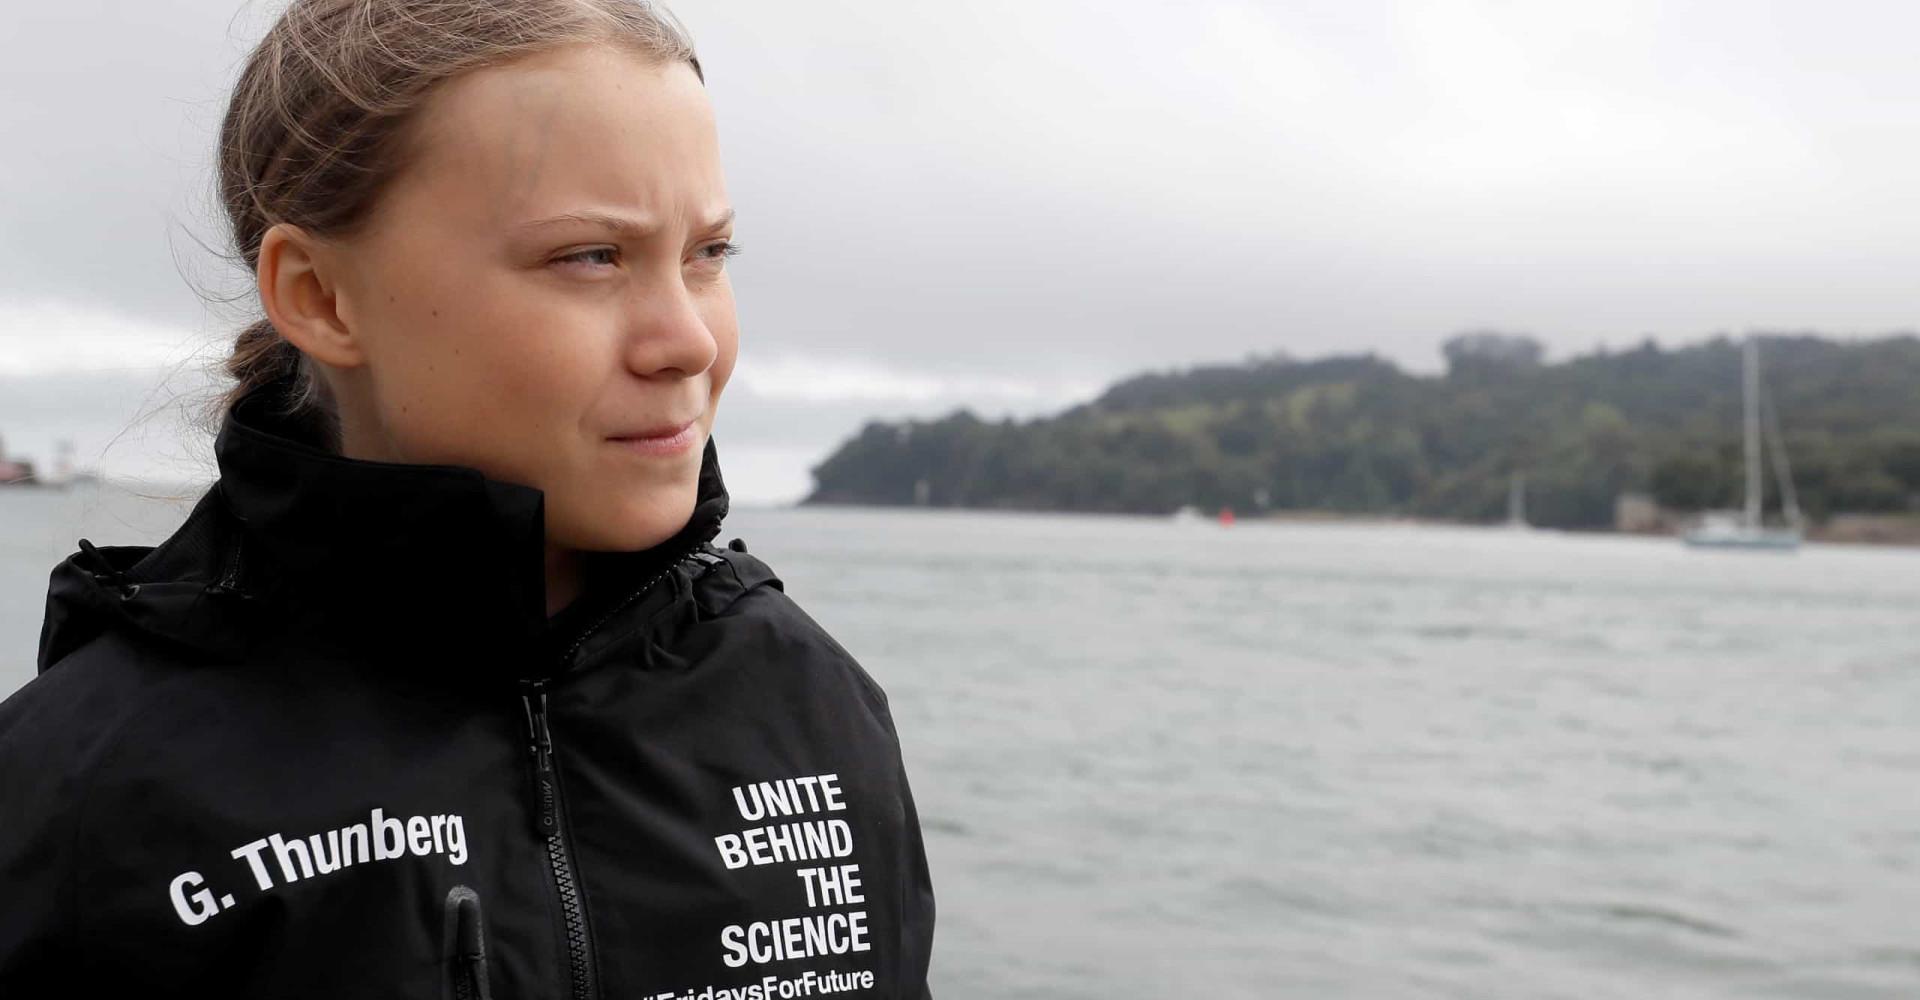 Greta Thunberg: a girl saving the world